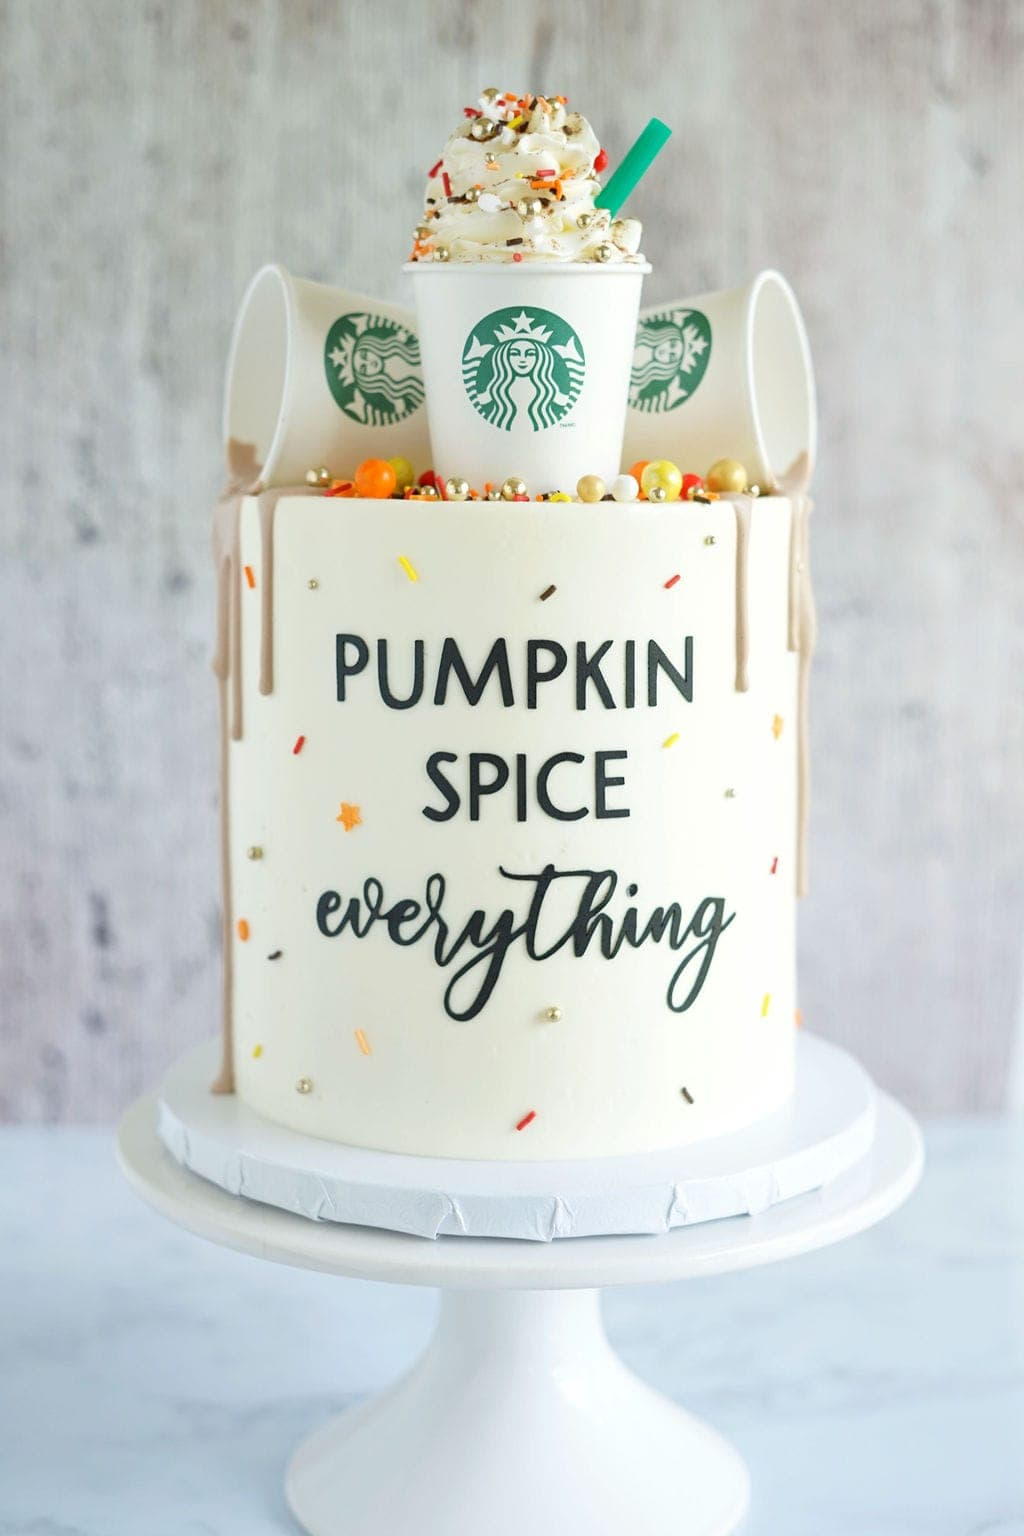 sprinkles on cake